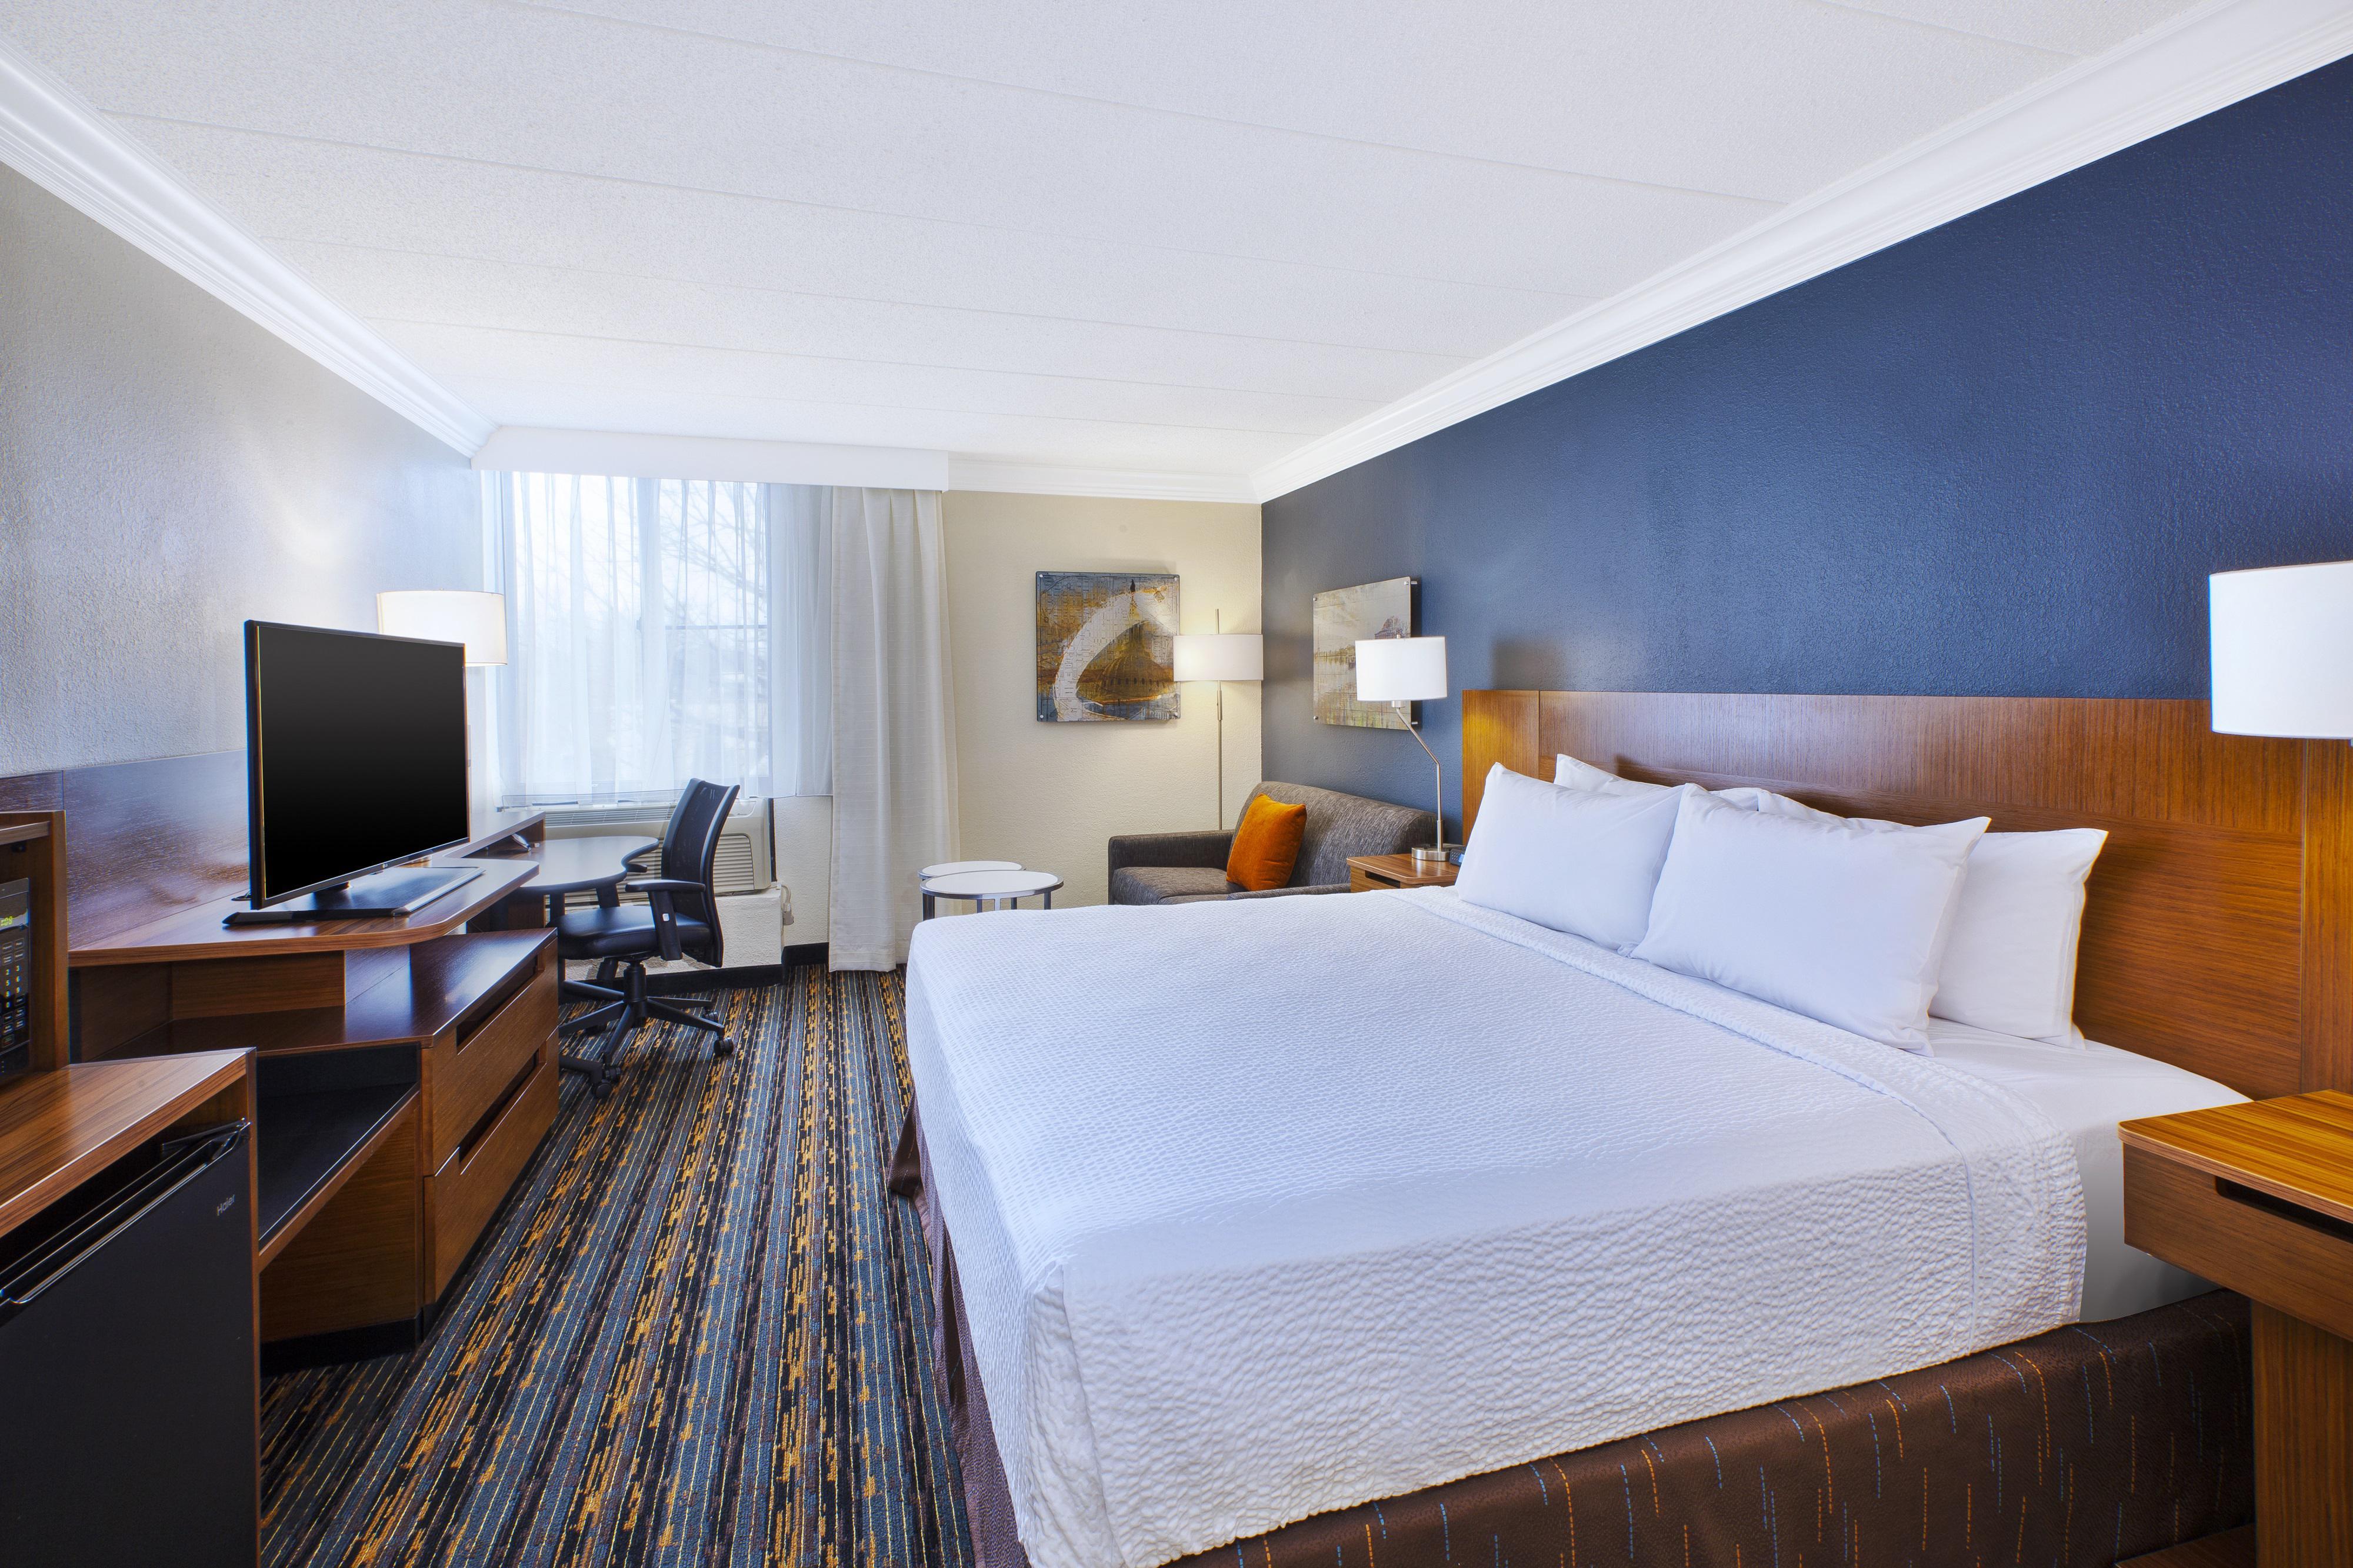 Fairfield Inn & Suites by Marriott Dulles Airport Herndon/Reston image 8